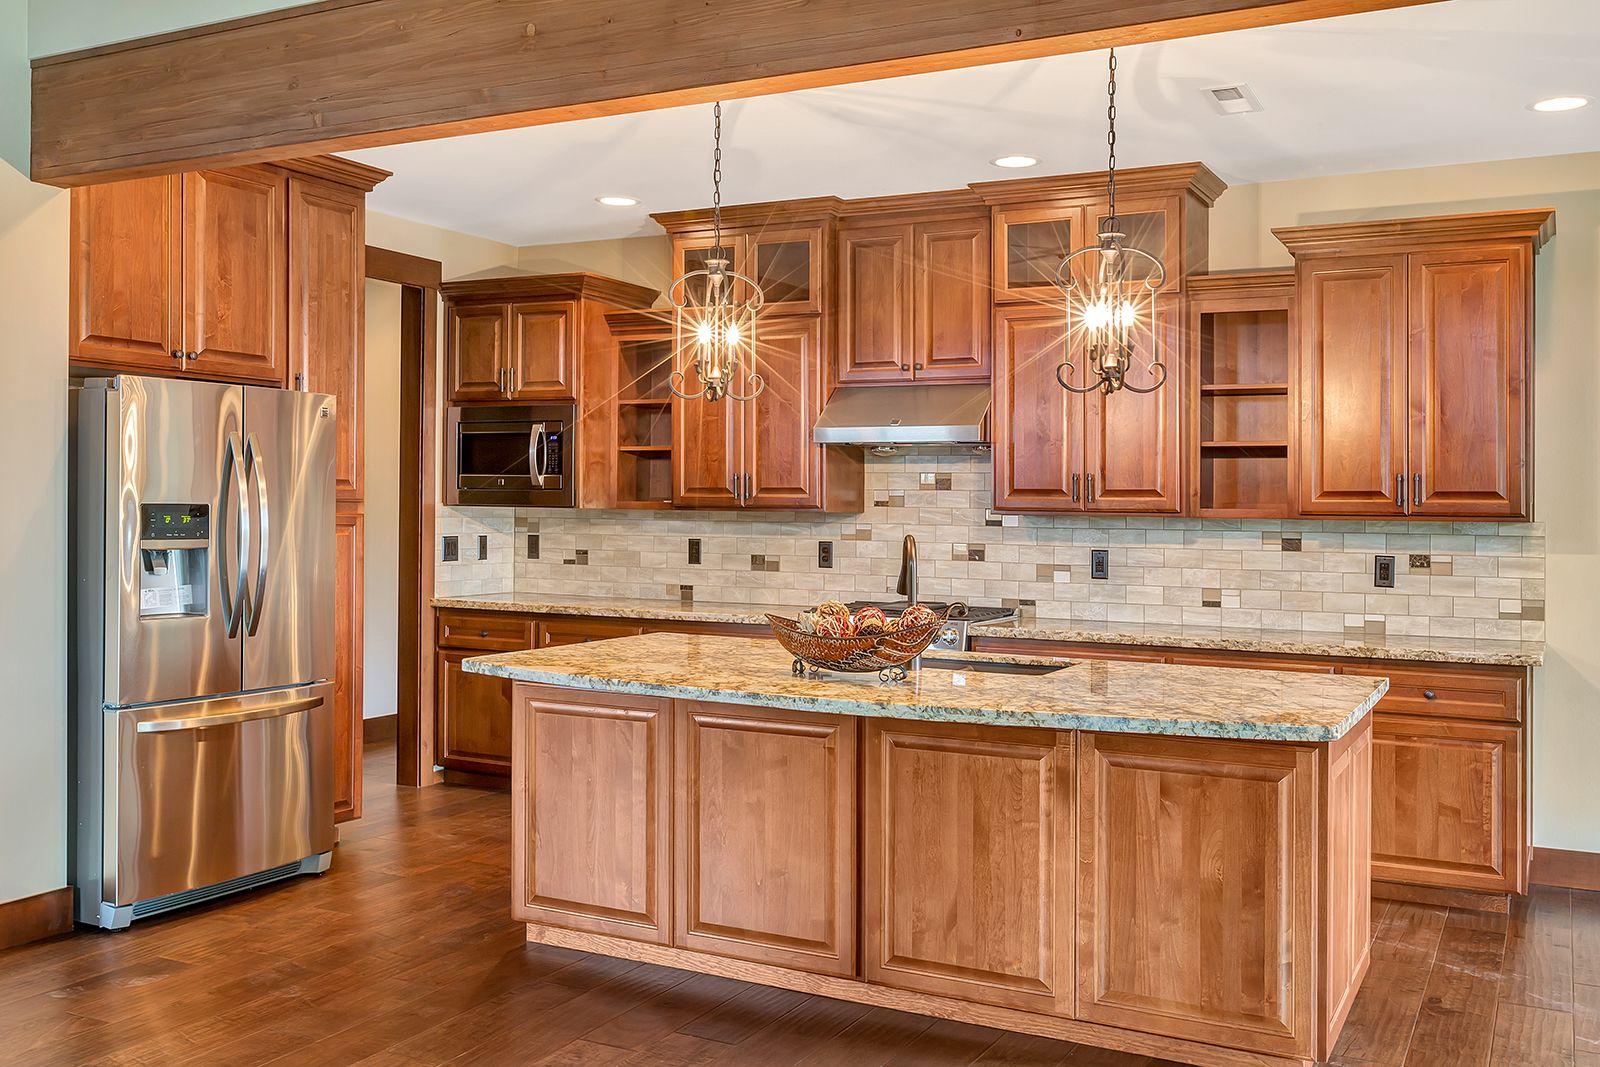 stunning craftsman style kitchen alder cabinets with raised panel